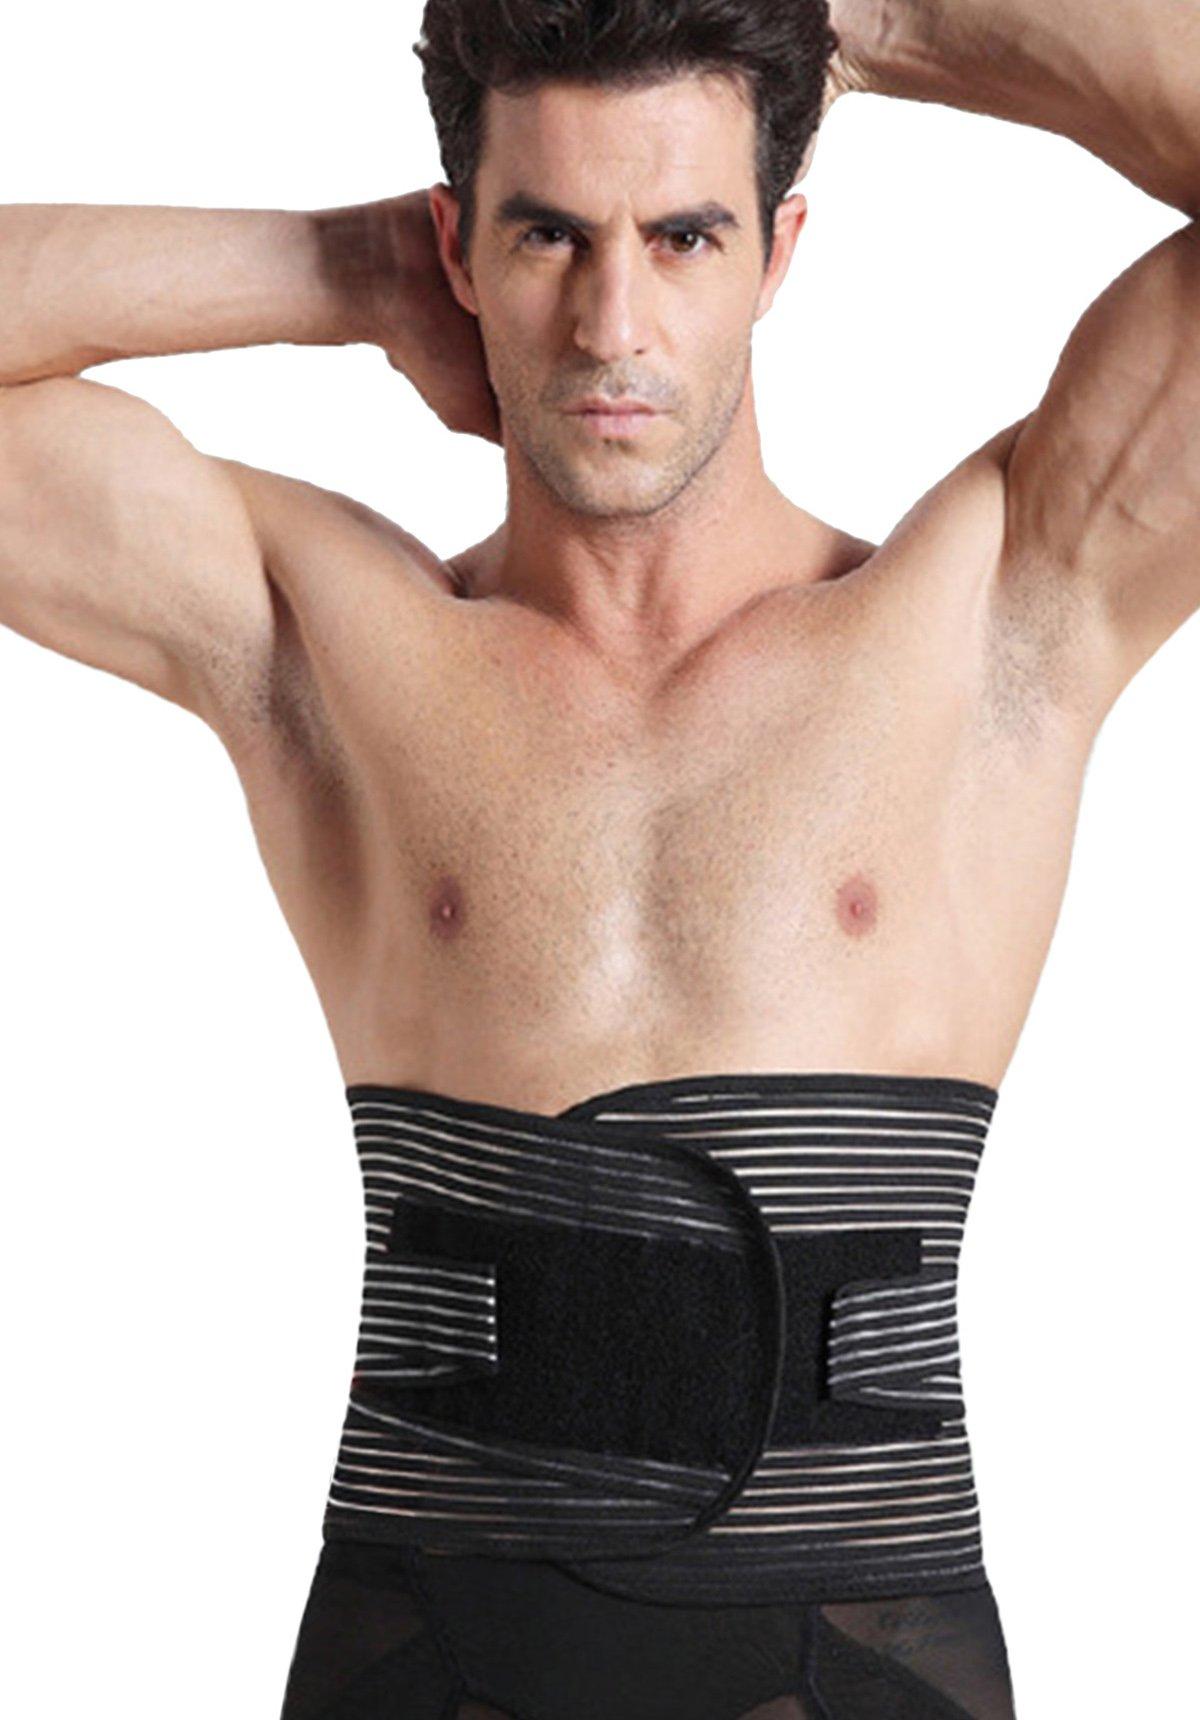 Panegy Men's Waist Trimmer Belt Elastic Lumbar Back Tranier Support Brace Band Body Shaper Size L Black